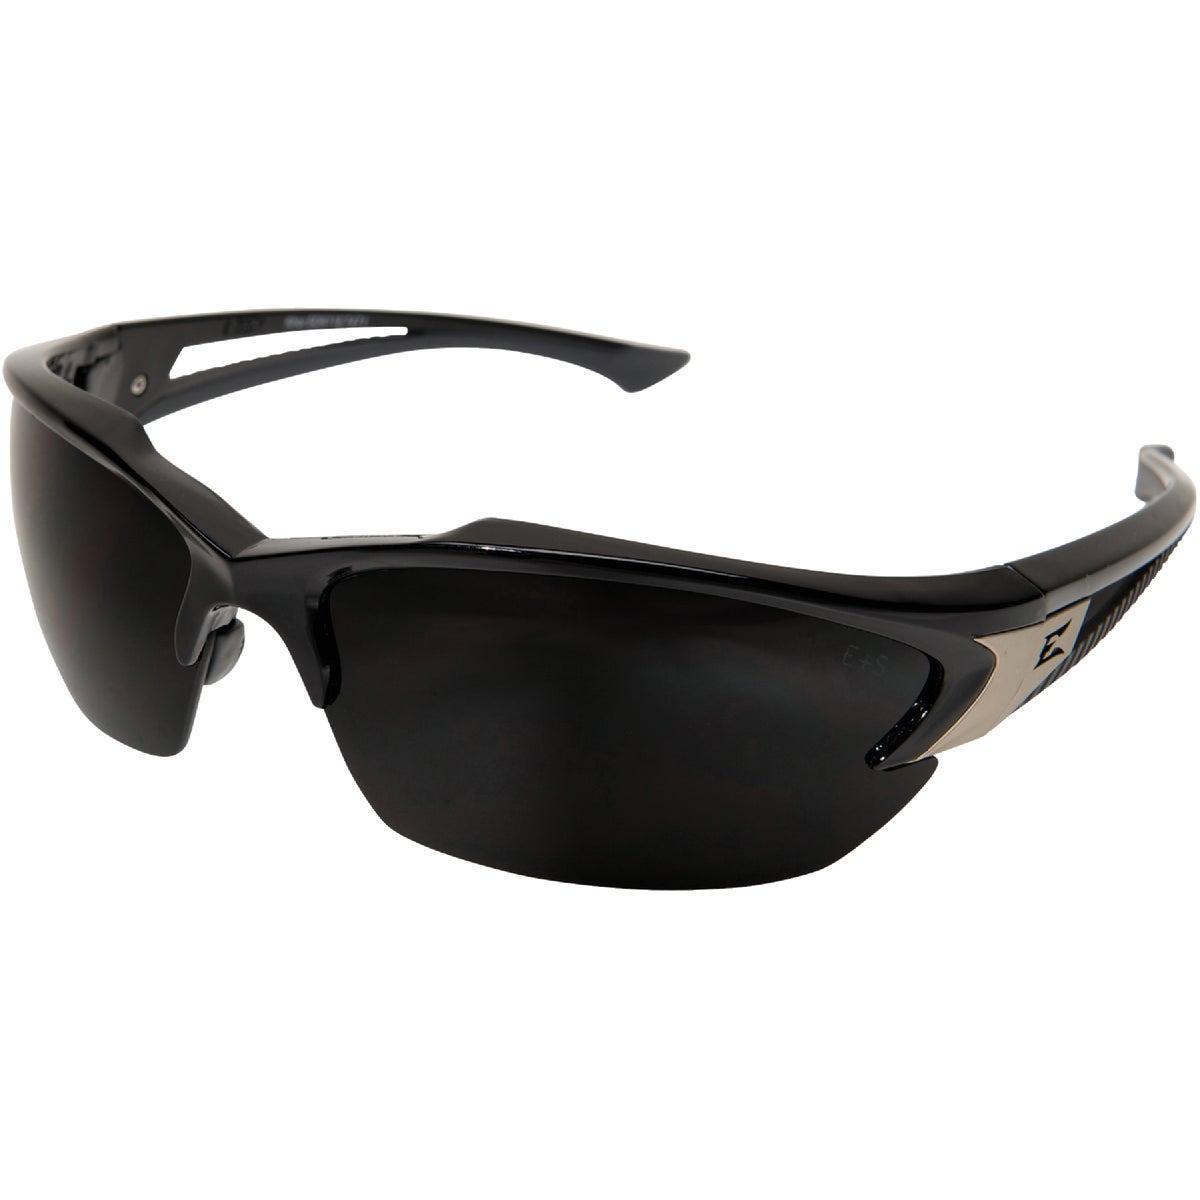 KHOR BLACK/SMOKE LENS - SDK116 by Edge Eyewear